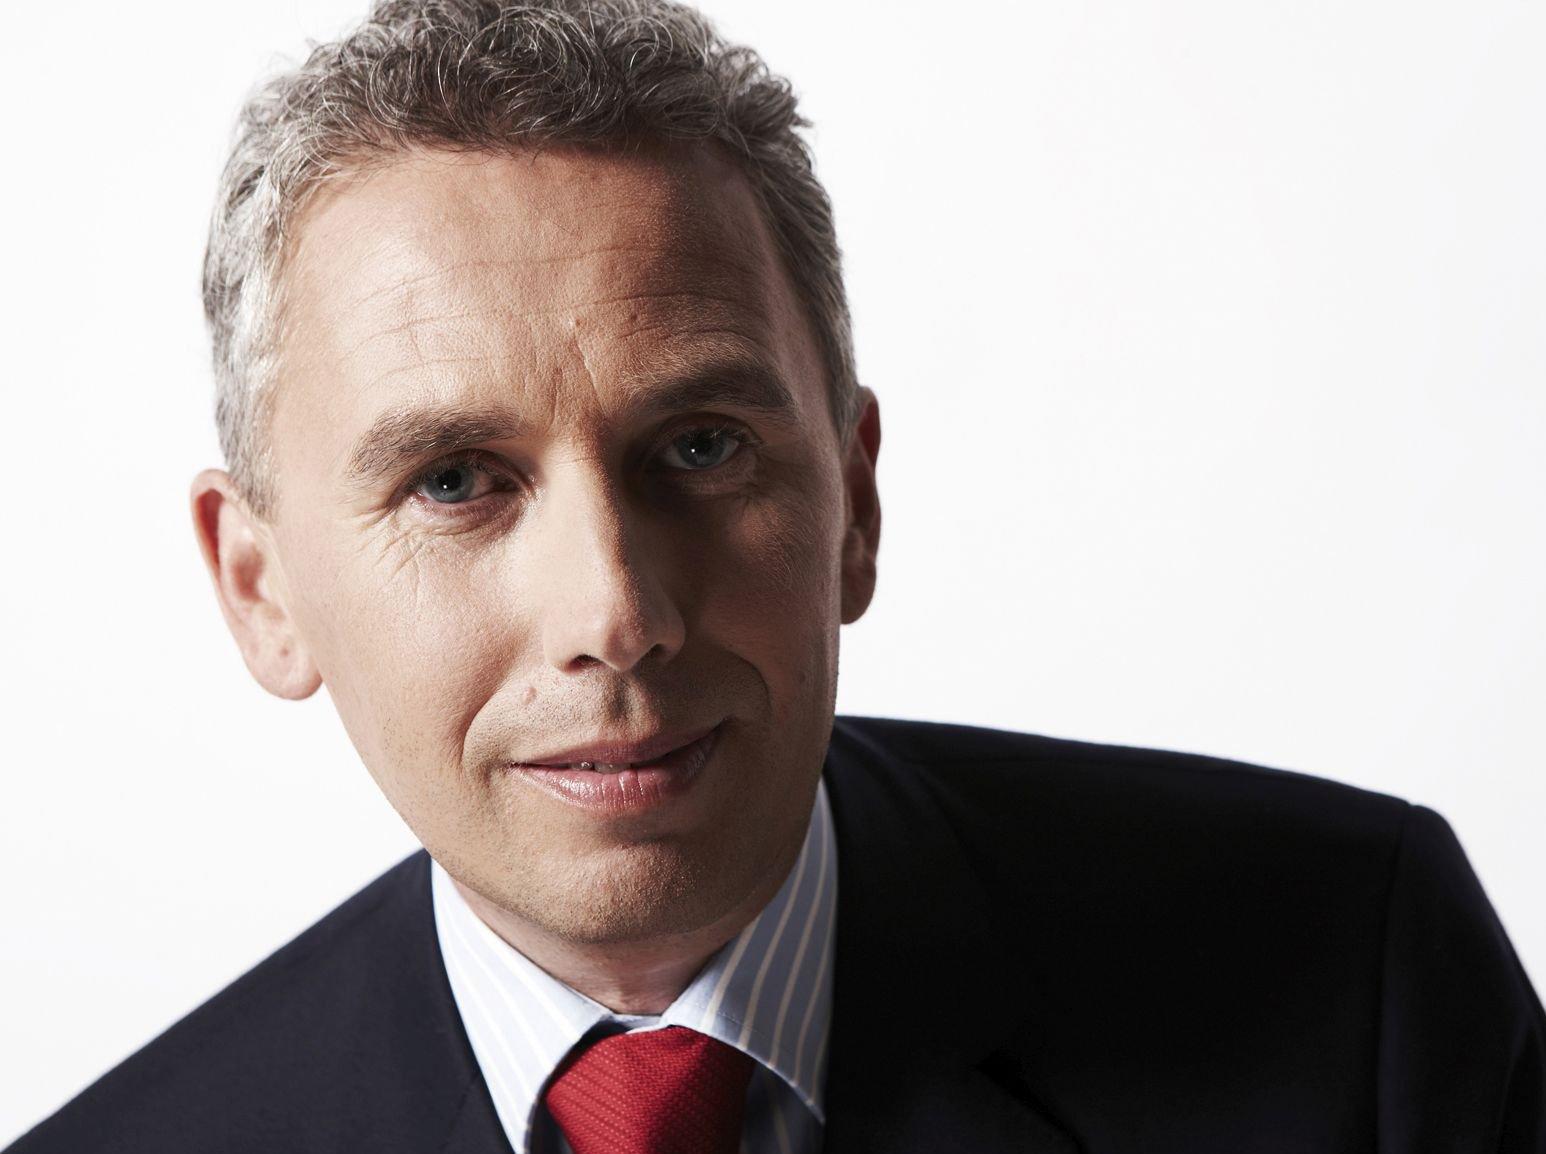 Franz Solta, Geschäftsführer von INFOSCREEN Austria (Bild: INFOSCREEN Austria)